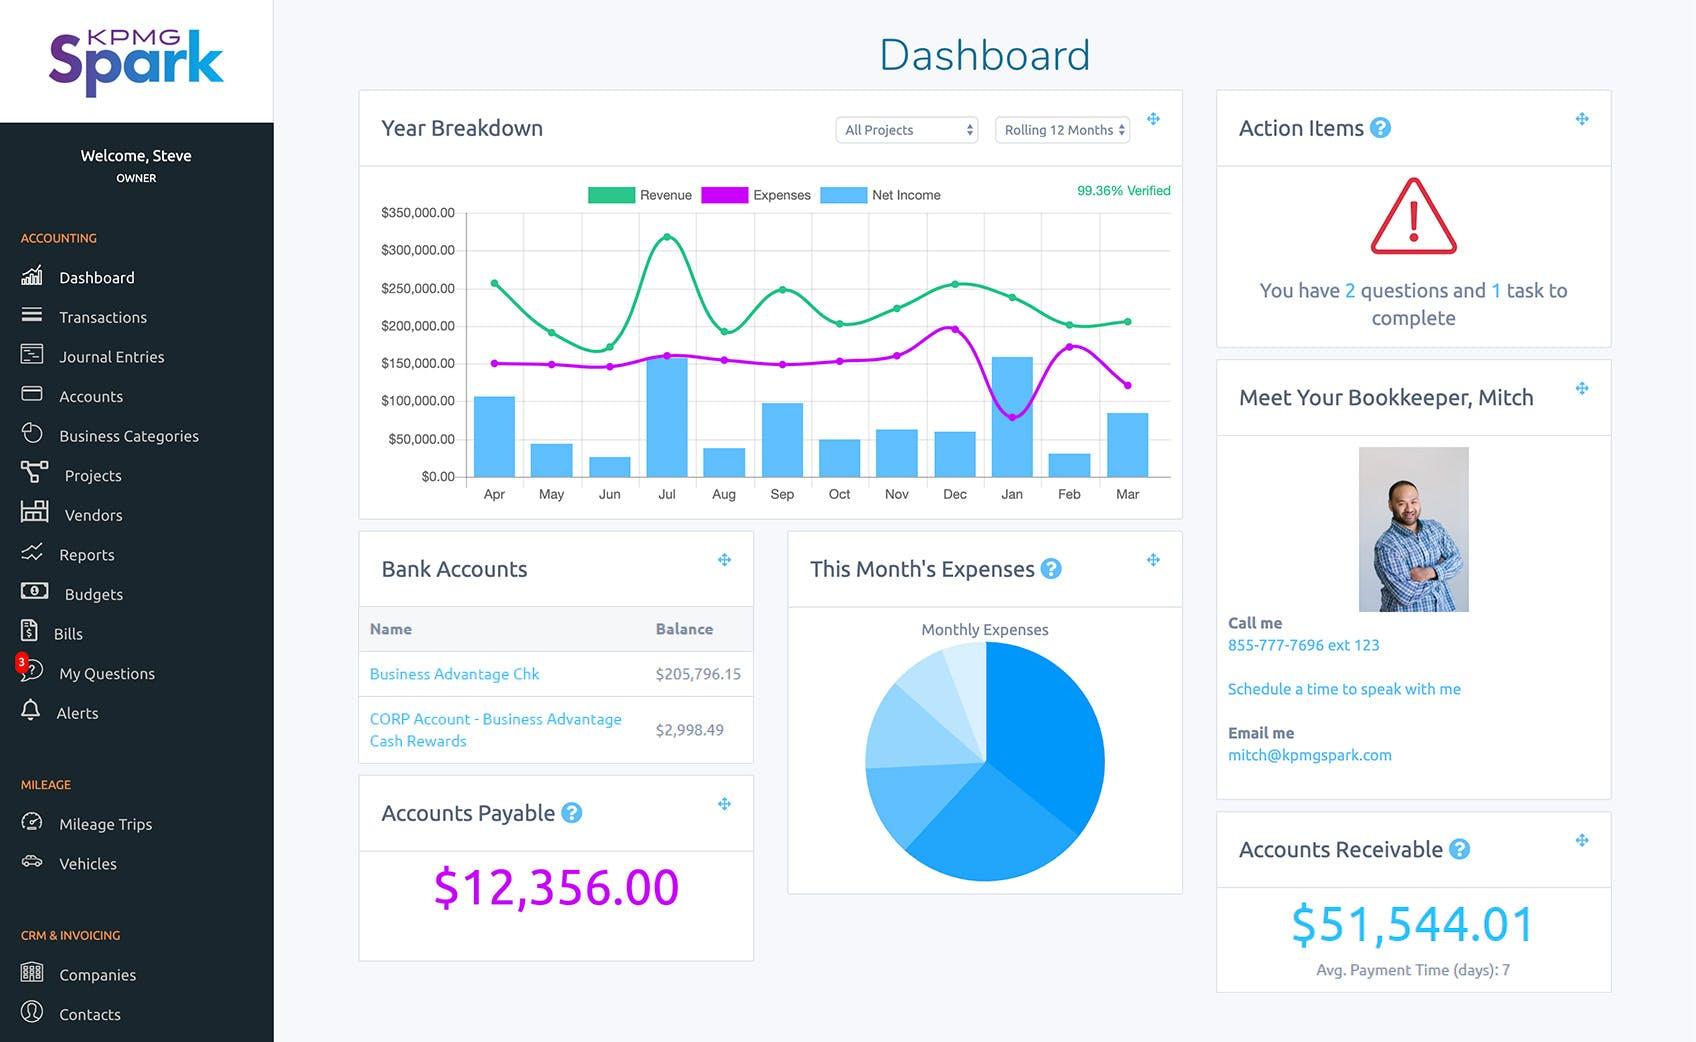 A screenshot of the KPMG Spark dashboard